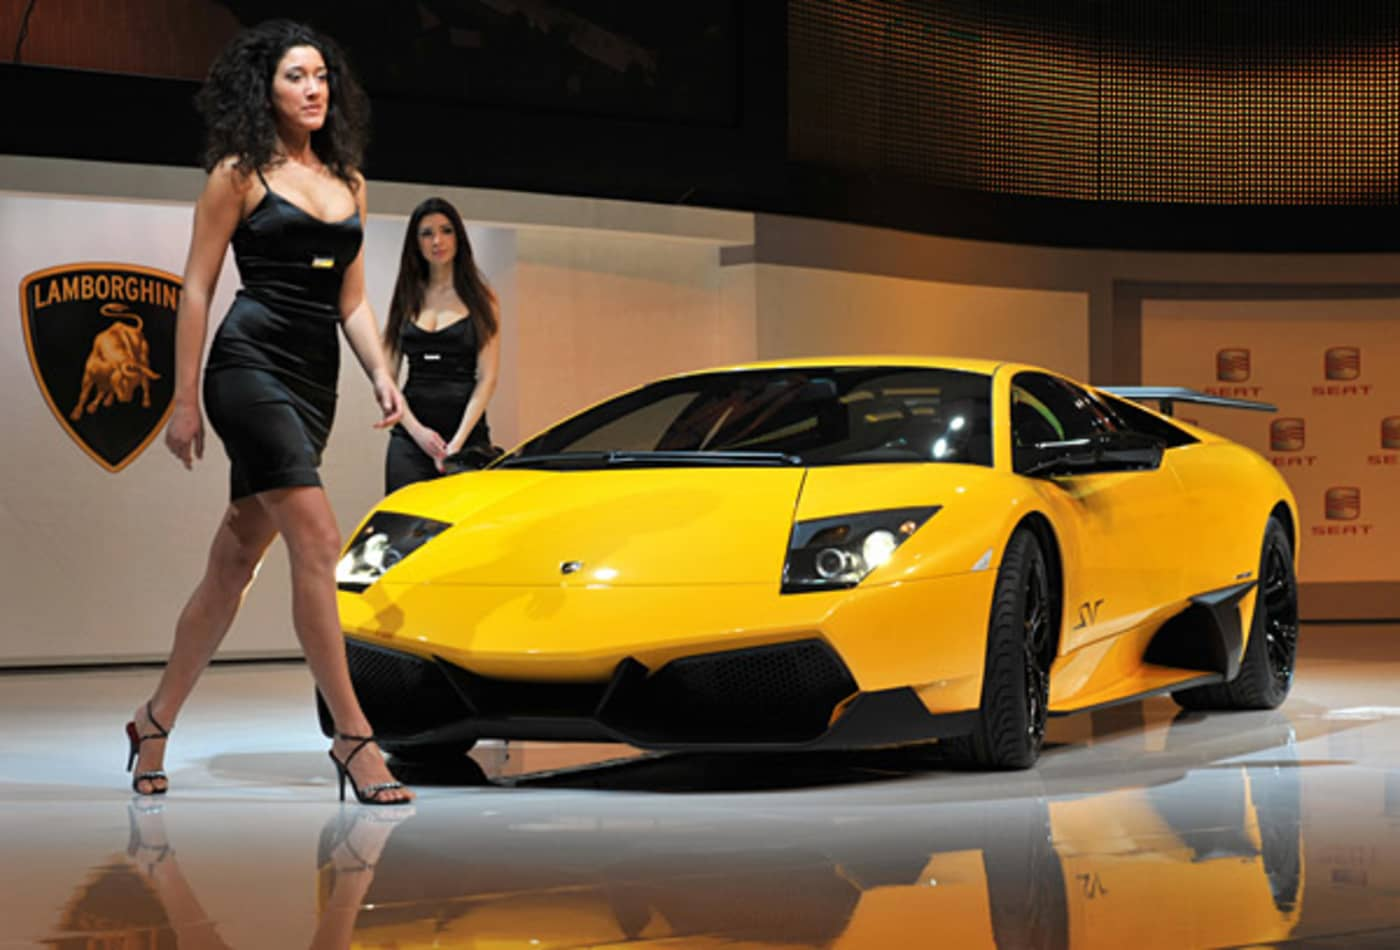 iacocca_cars_lamborghini.jpg